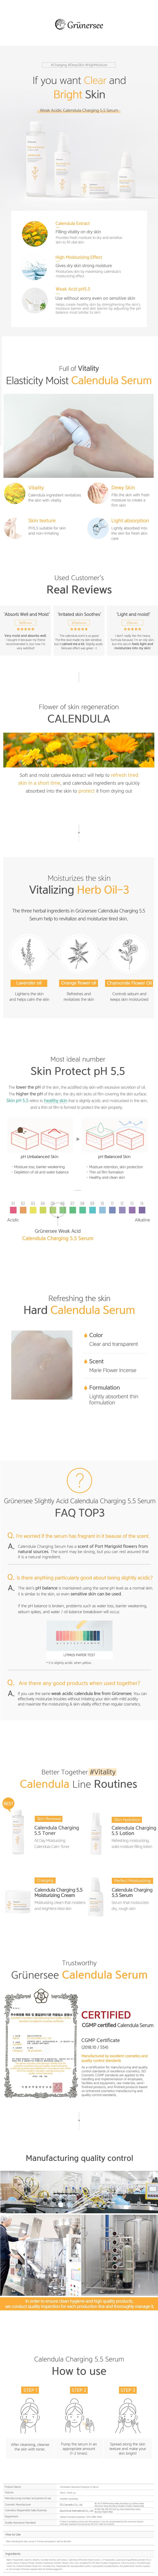 Calendula Charging 5.5 Serum - Info